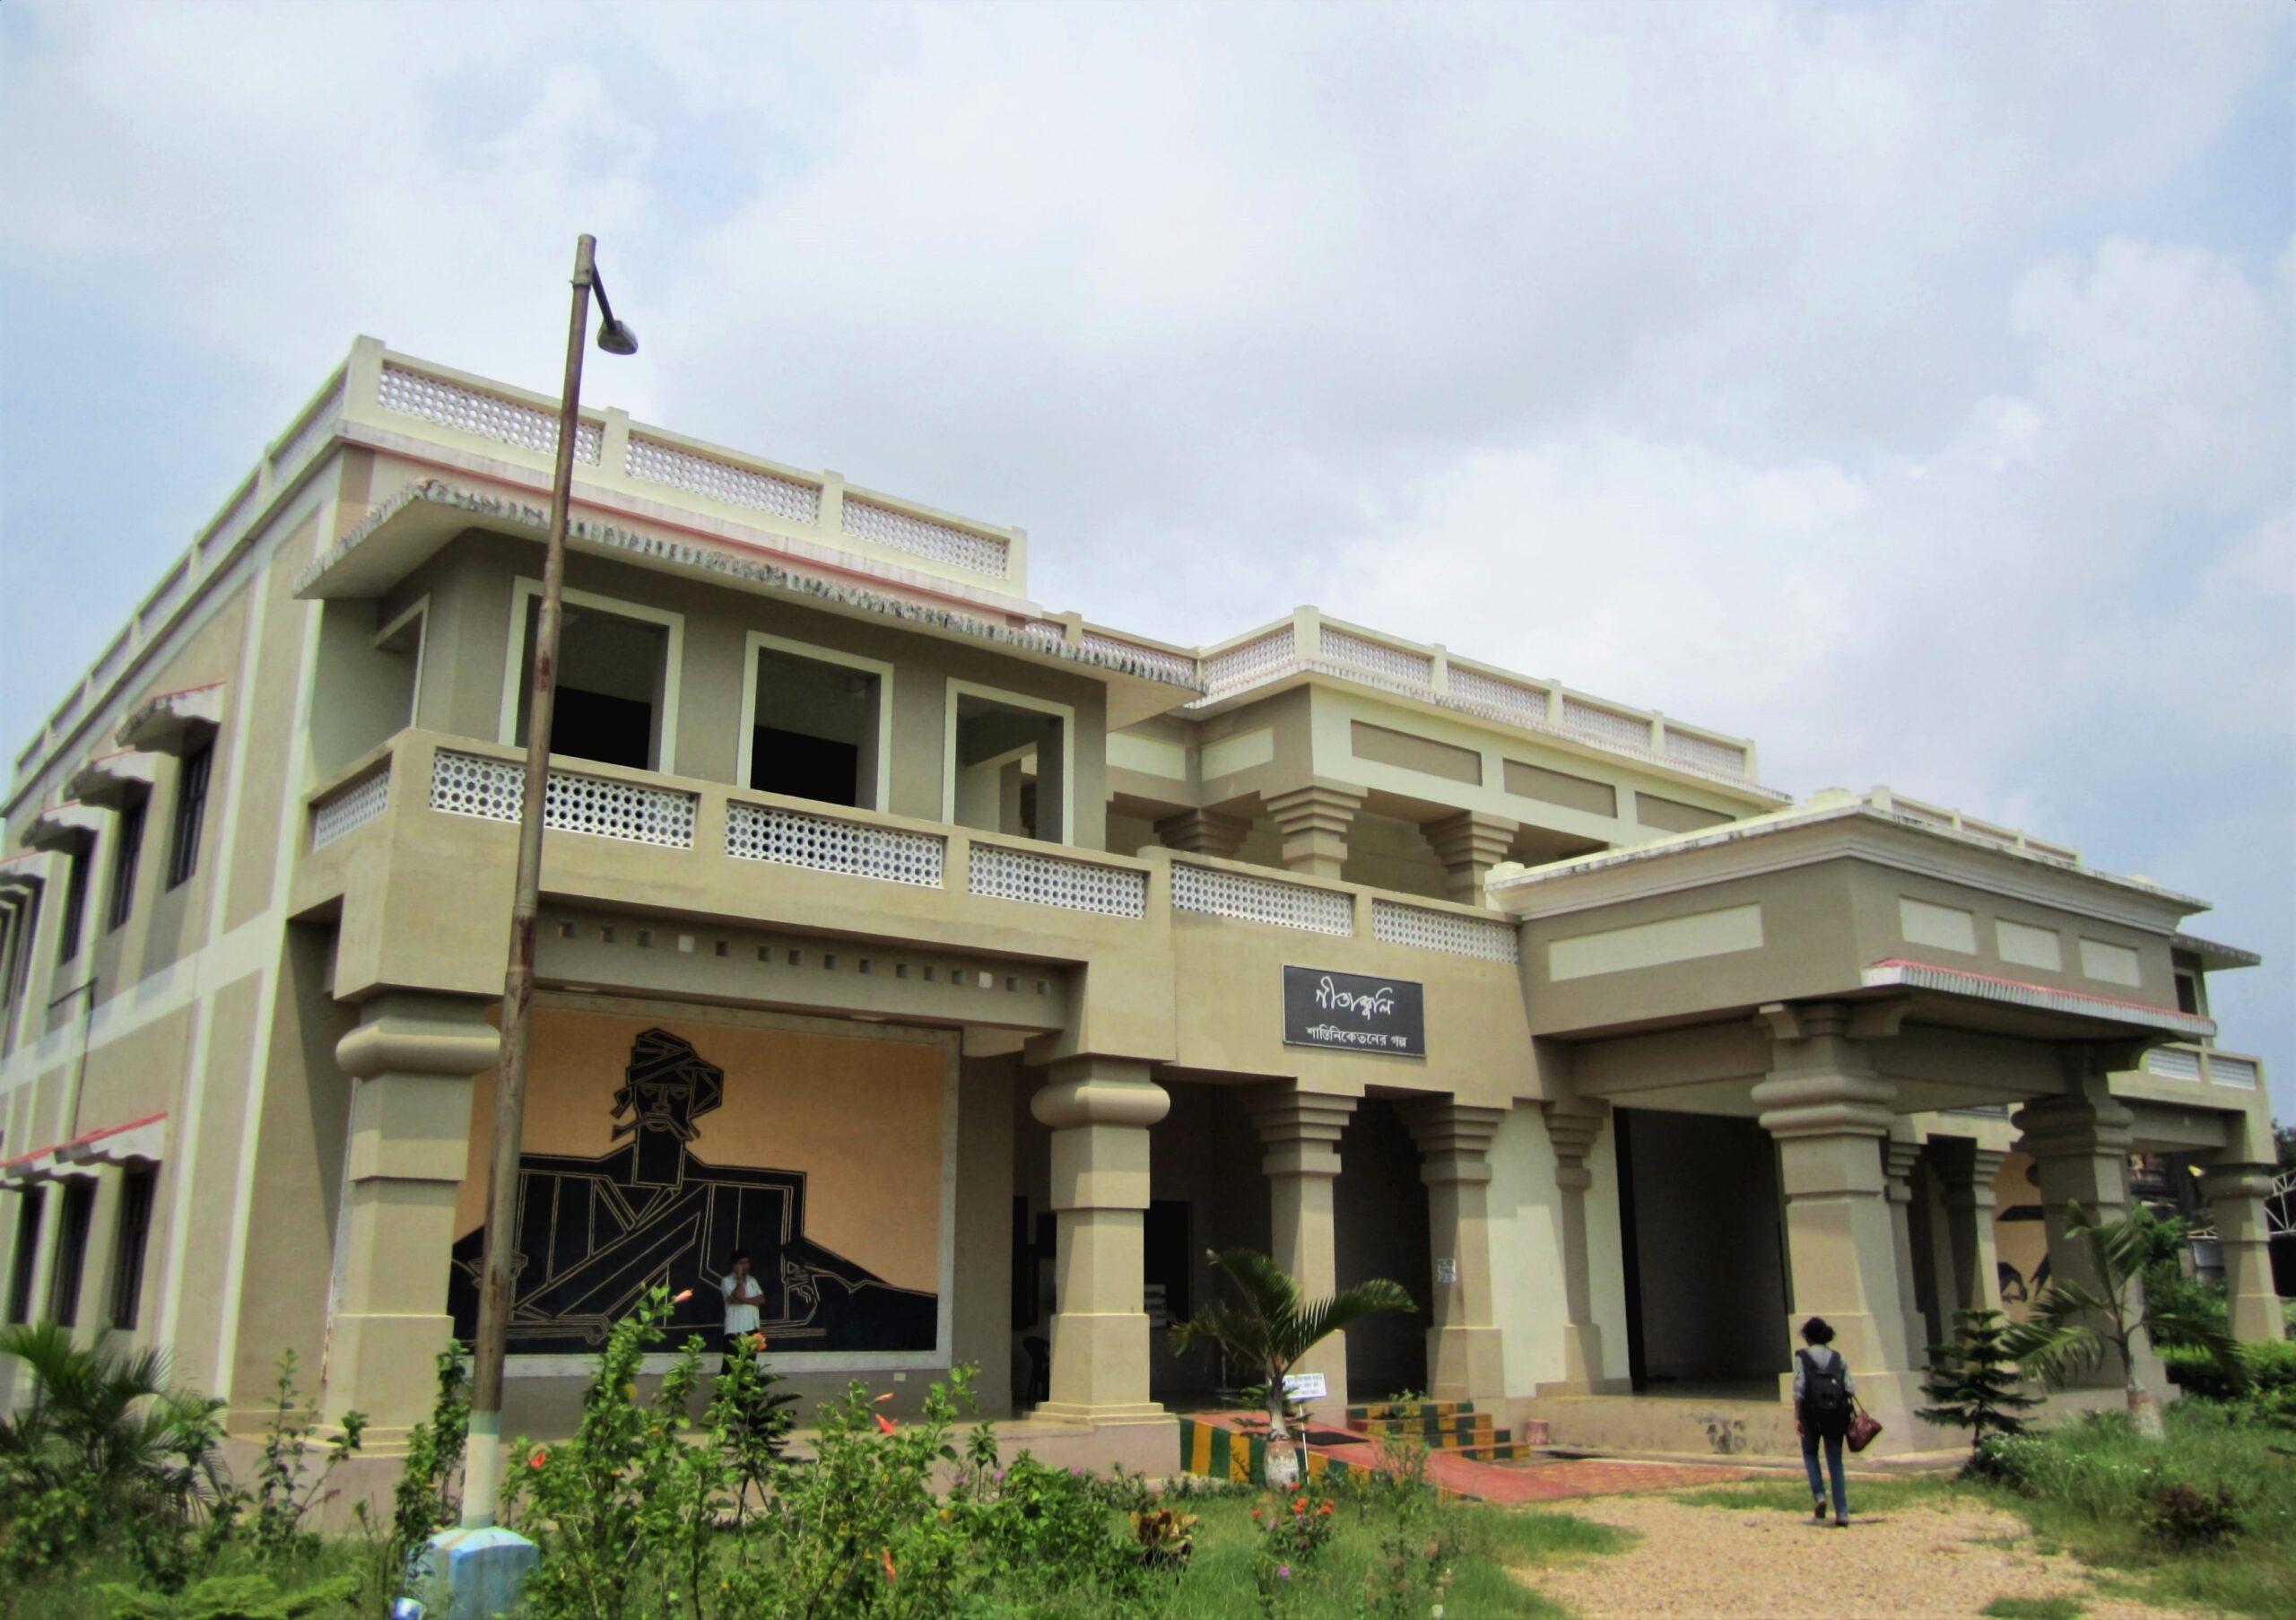 Geetanjali Museum